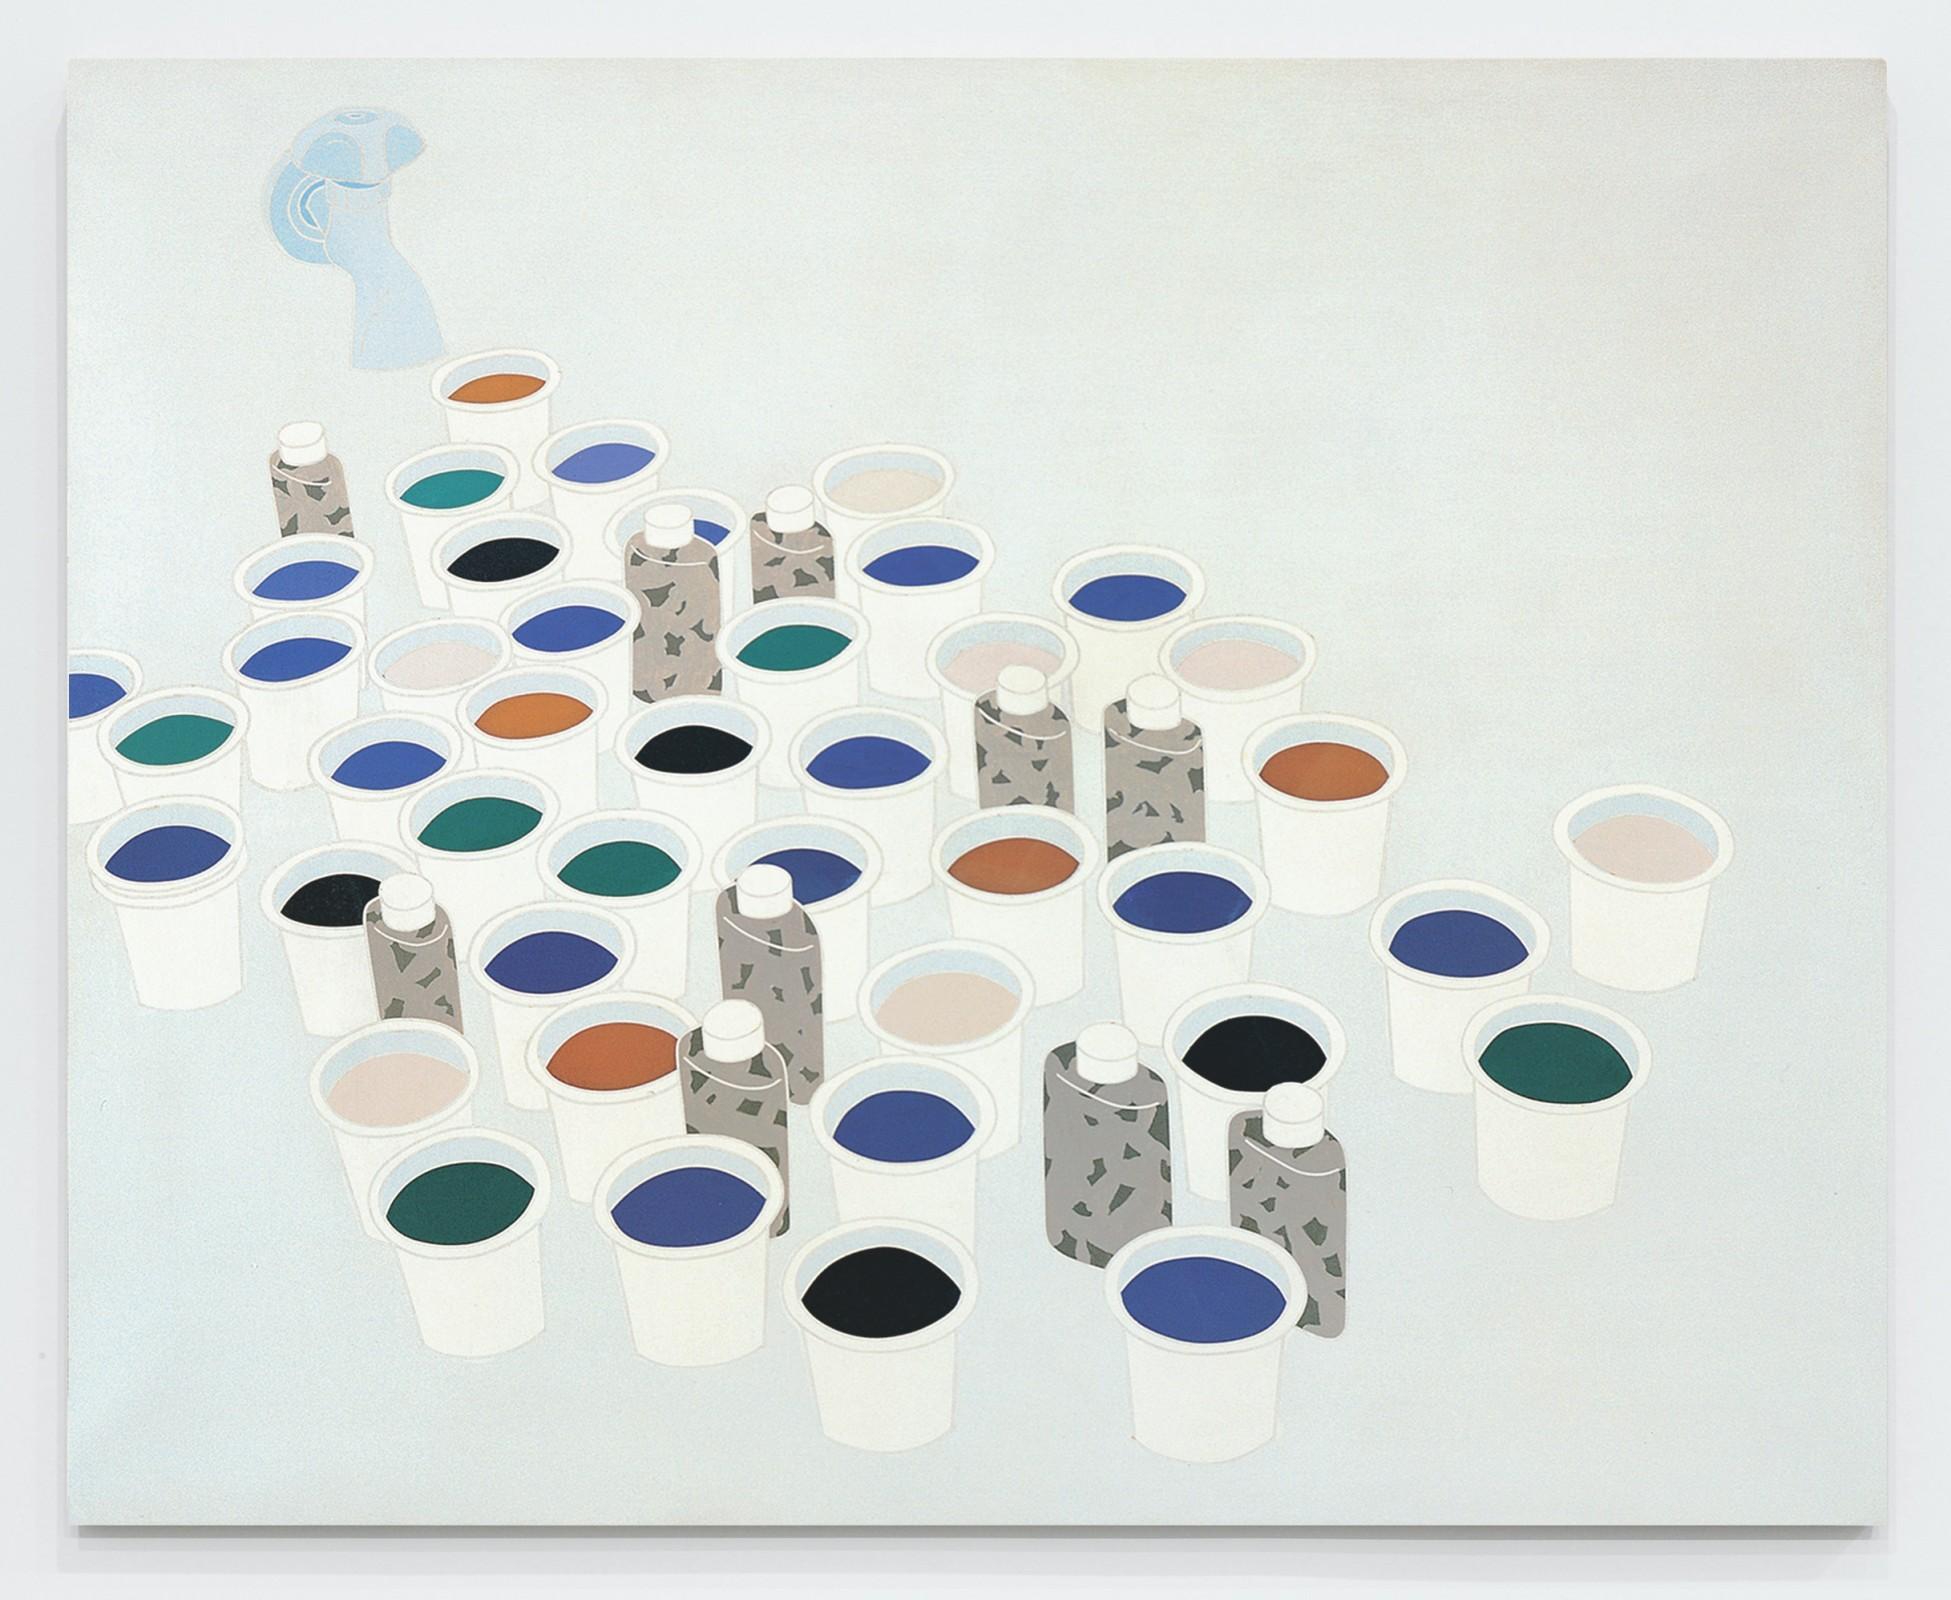 "<span class=""link fancybox-details-link""><a href=""/exhibitions/553/works/artworks_standalone11002/"">View Detail Page</a></span><div class=""artist""><span class=""artist""><strong>EMILIO TADINI</strong></span></div><div class=""title""><em>Paesaggio nello studio. Color & Co. / Landscape in the Studio</em>, 1970</div><div class=""medium"">Acrylic on canvas</div><div class=""dimensions"">130 x 160 cm<br>51 ⅛ x 63 inches</div><div class=""price price_unavailable"">Sold</div>"